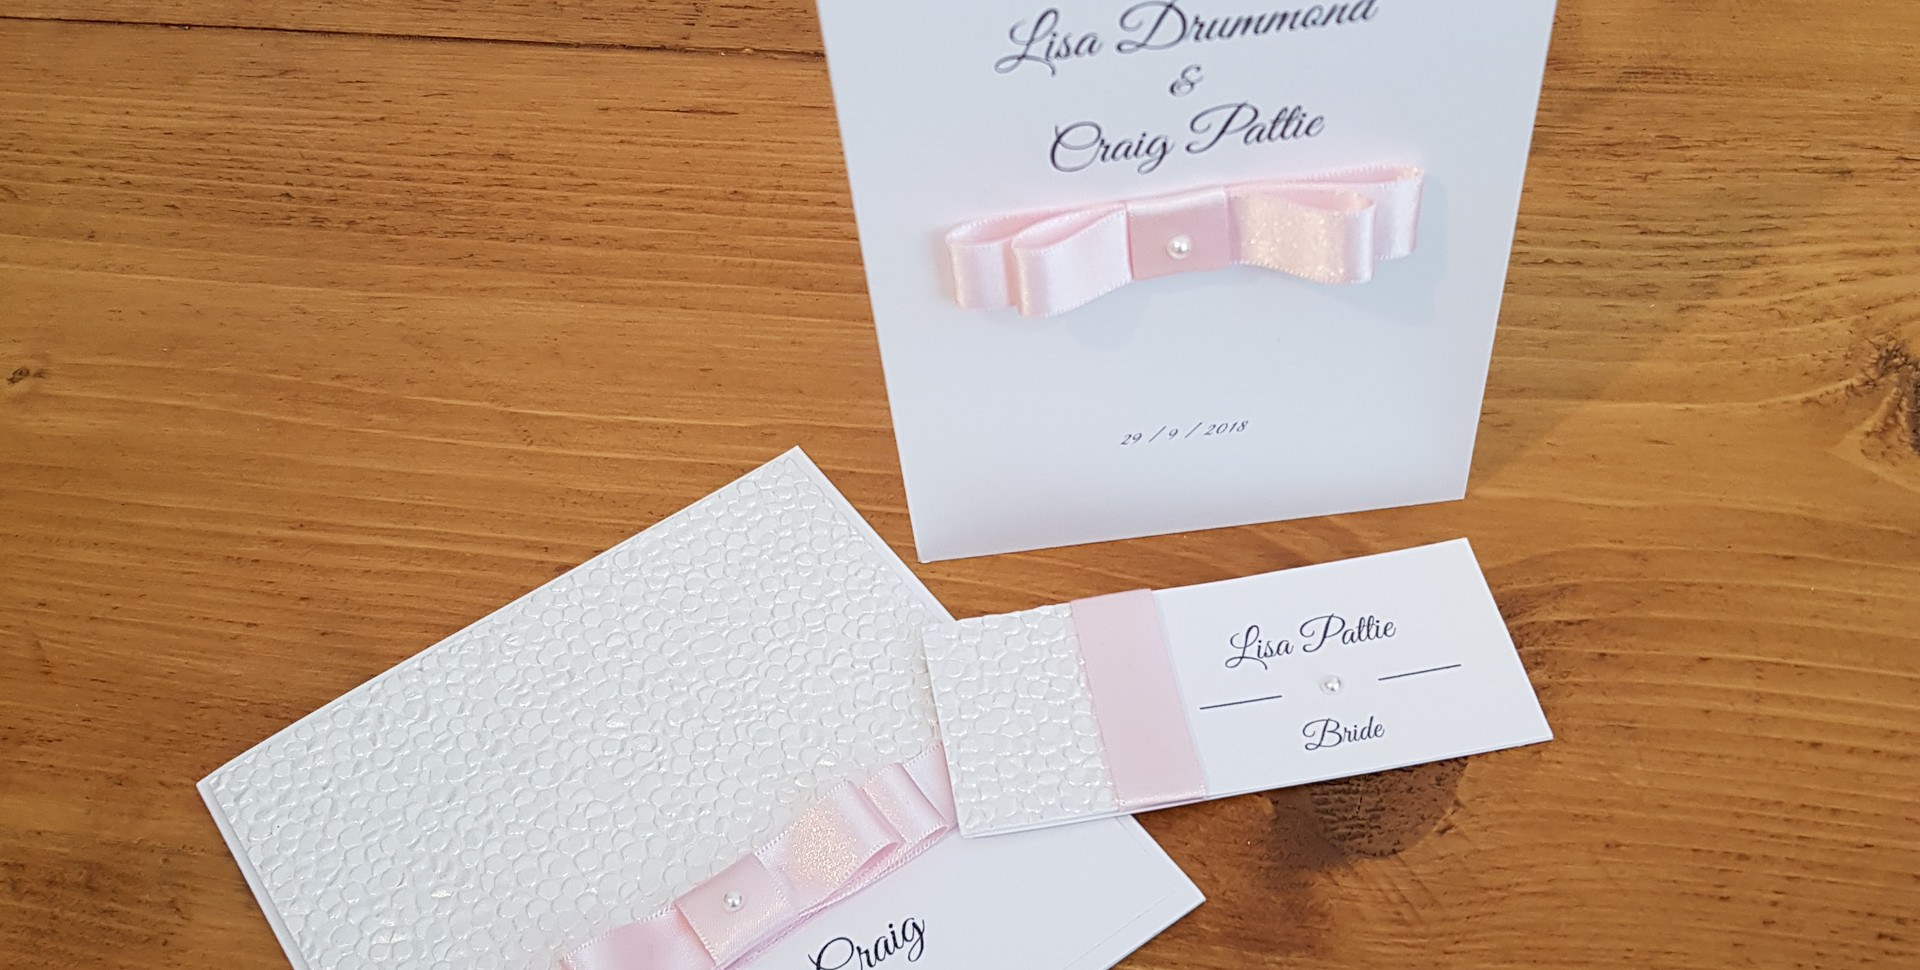 Lisa - Wedding stationery